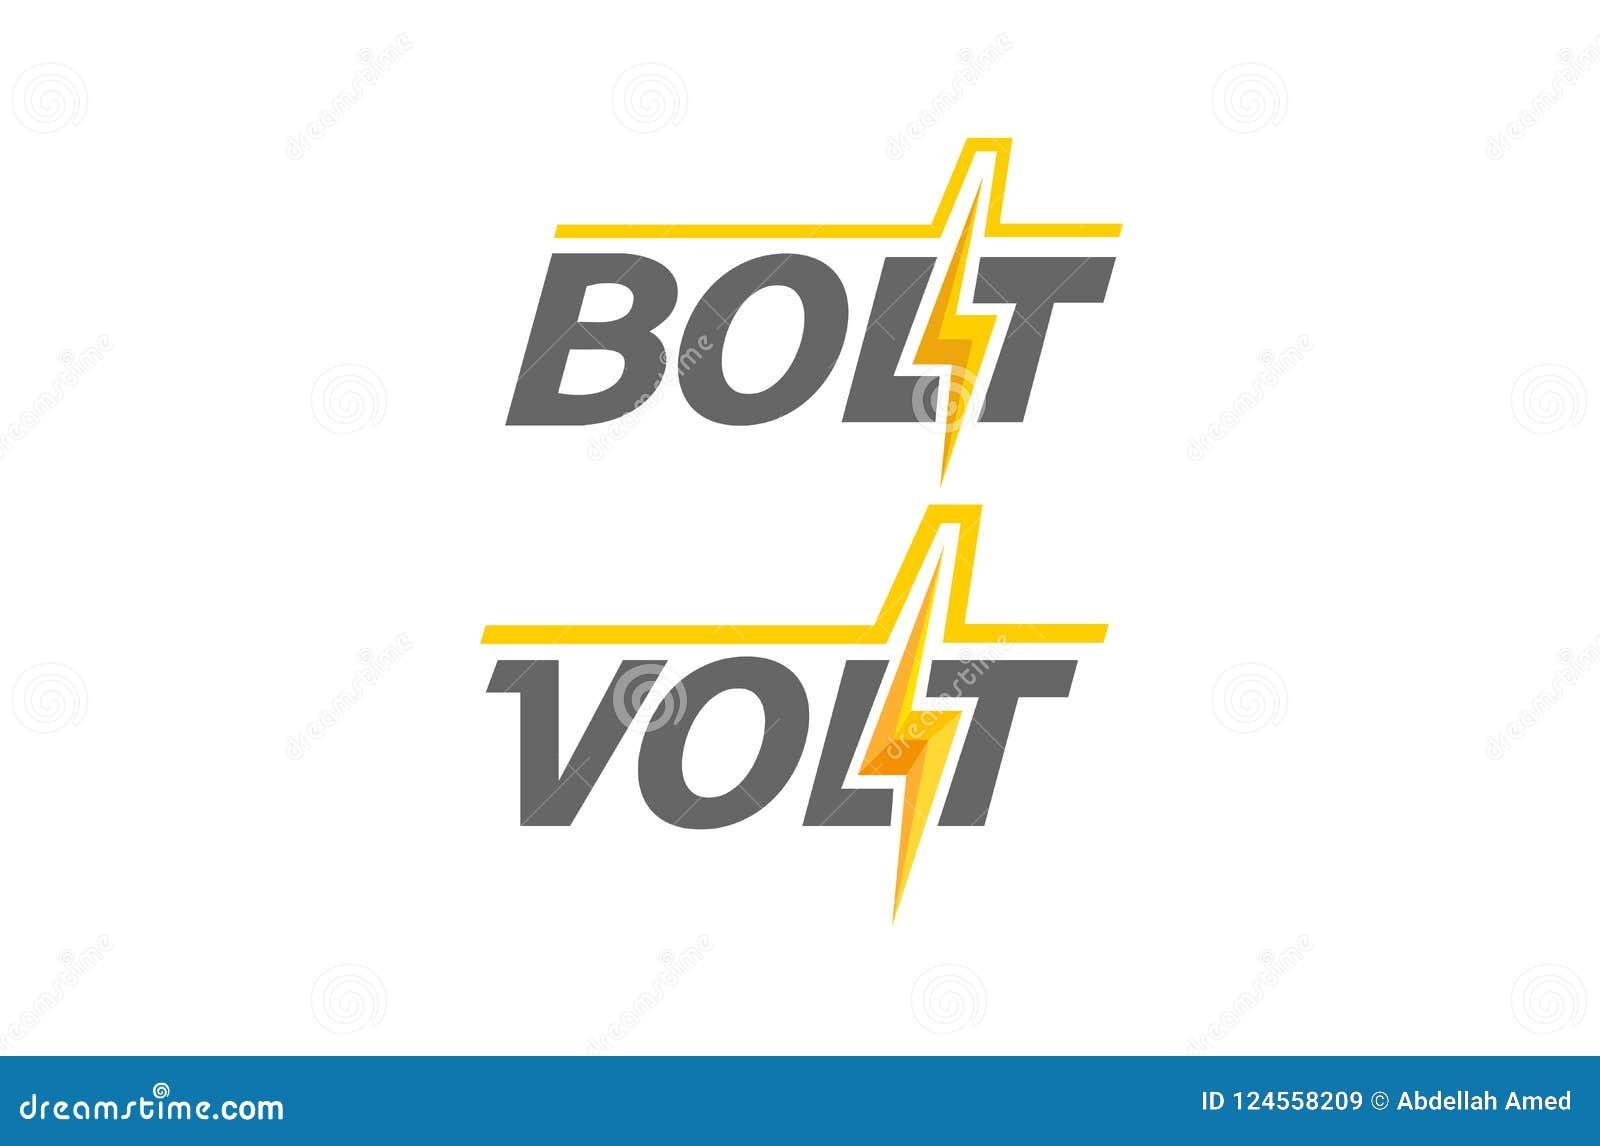 Creative Letter Power Bolt Text Symbol Design Stock Vector